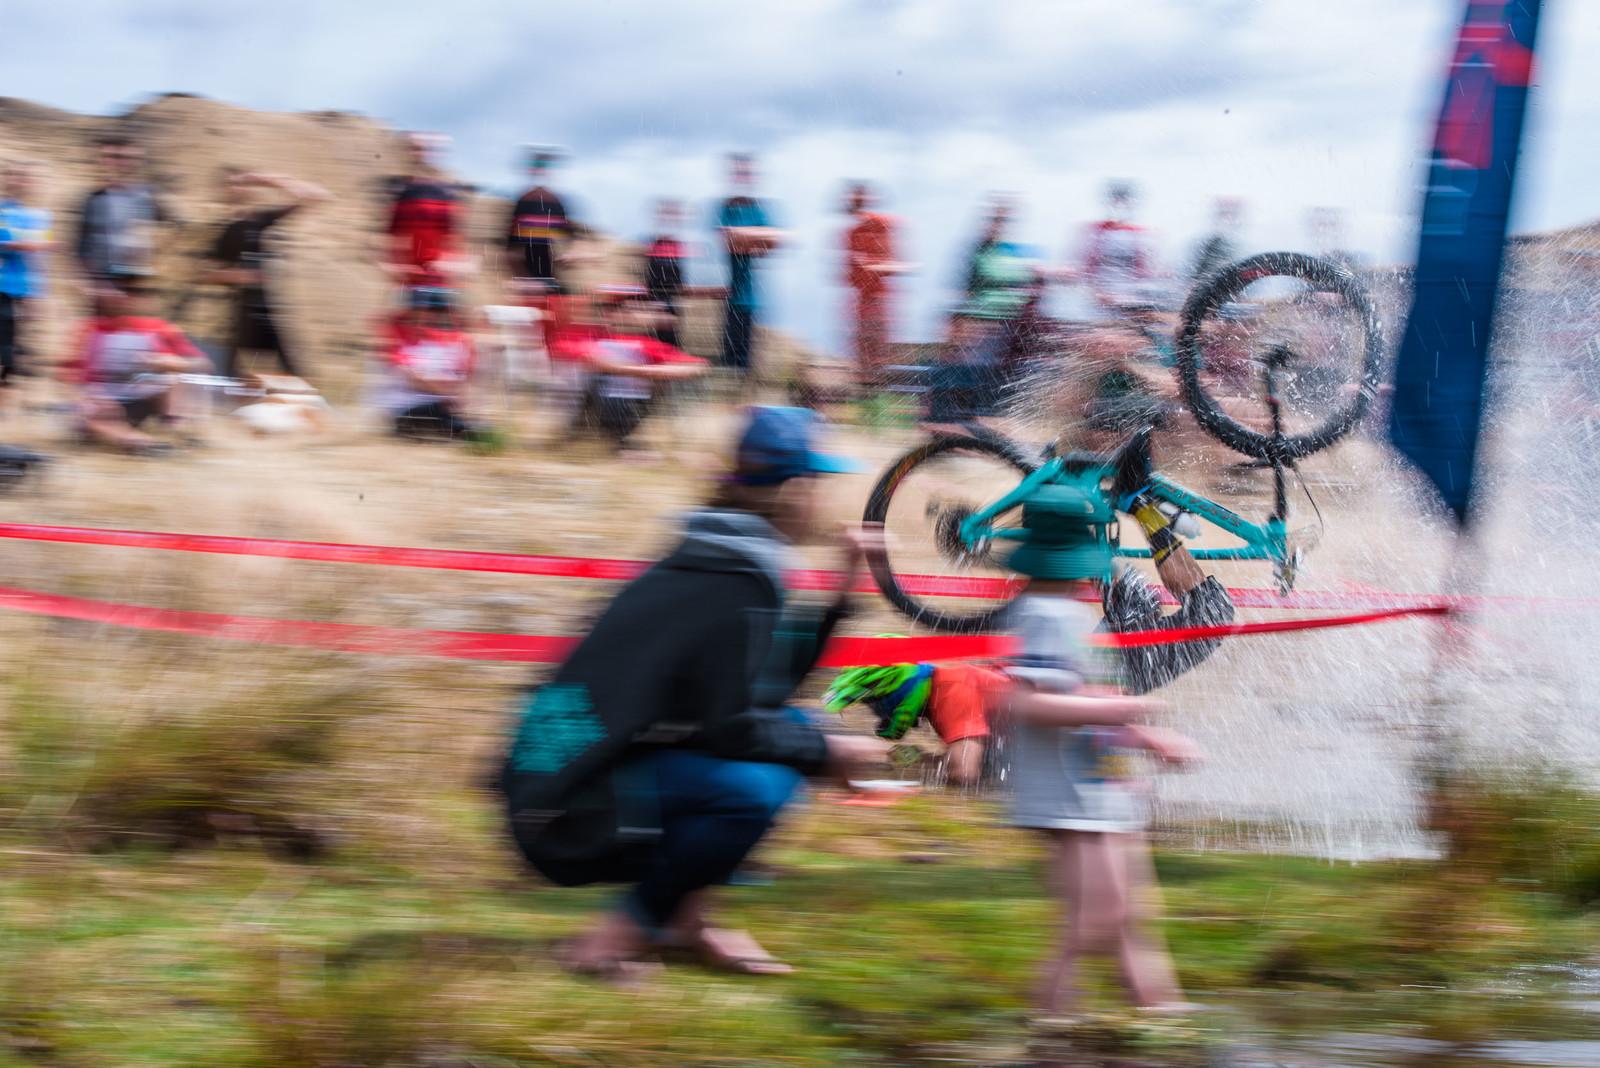 NZenduro19 day 3 DShaw-8964 - 2019 NZ Enduro Day 3 Photo Gallery - Mountain Biking Pictures - Vital MTB